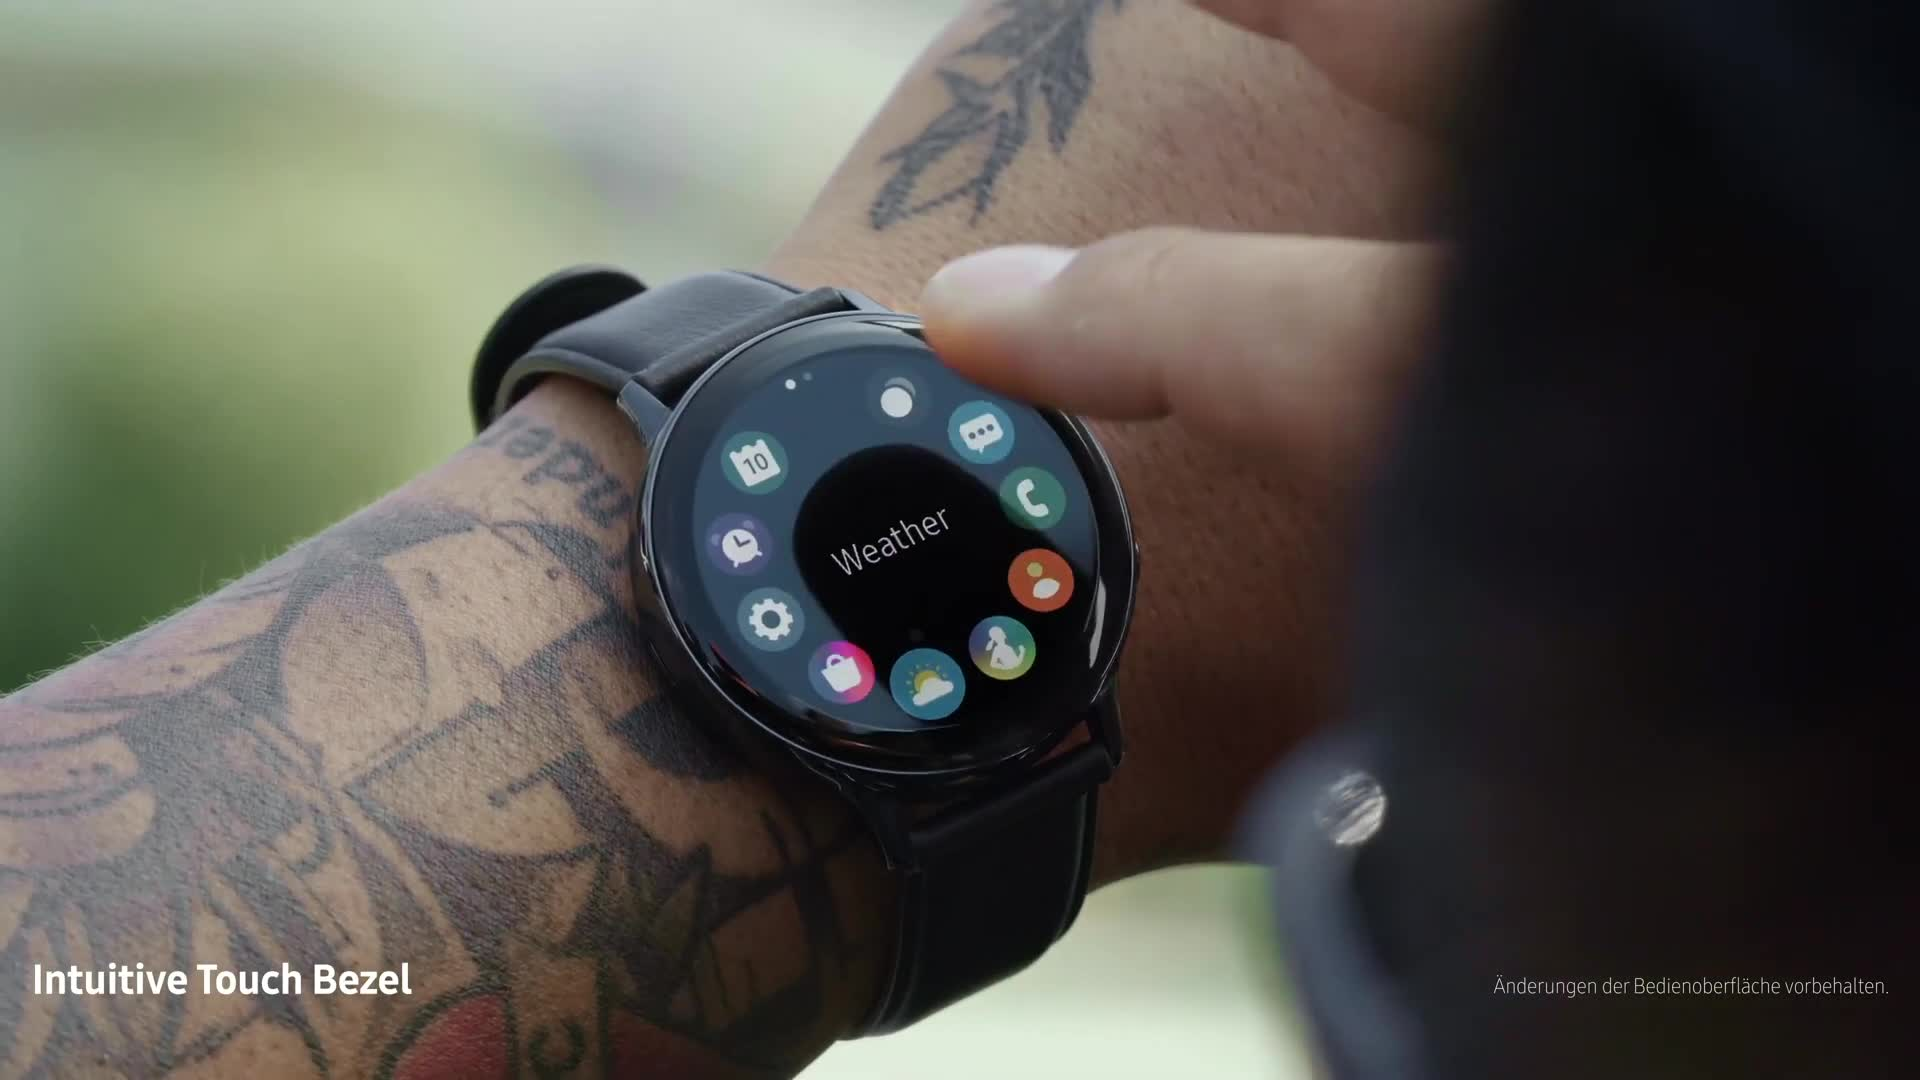 Samsung, Samsung Galaxy, Galaxy, smartwatch, Wearables, Samsung Galaxy Watch, Galaxy Watch, Samsung Galaxy Watch Active 2, Galaxy Watch Active 2